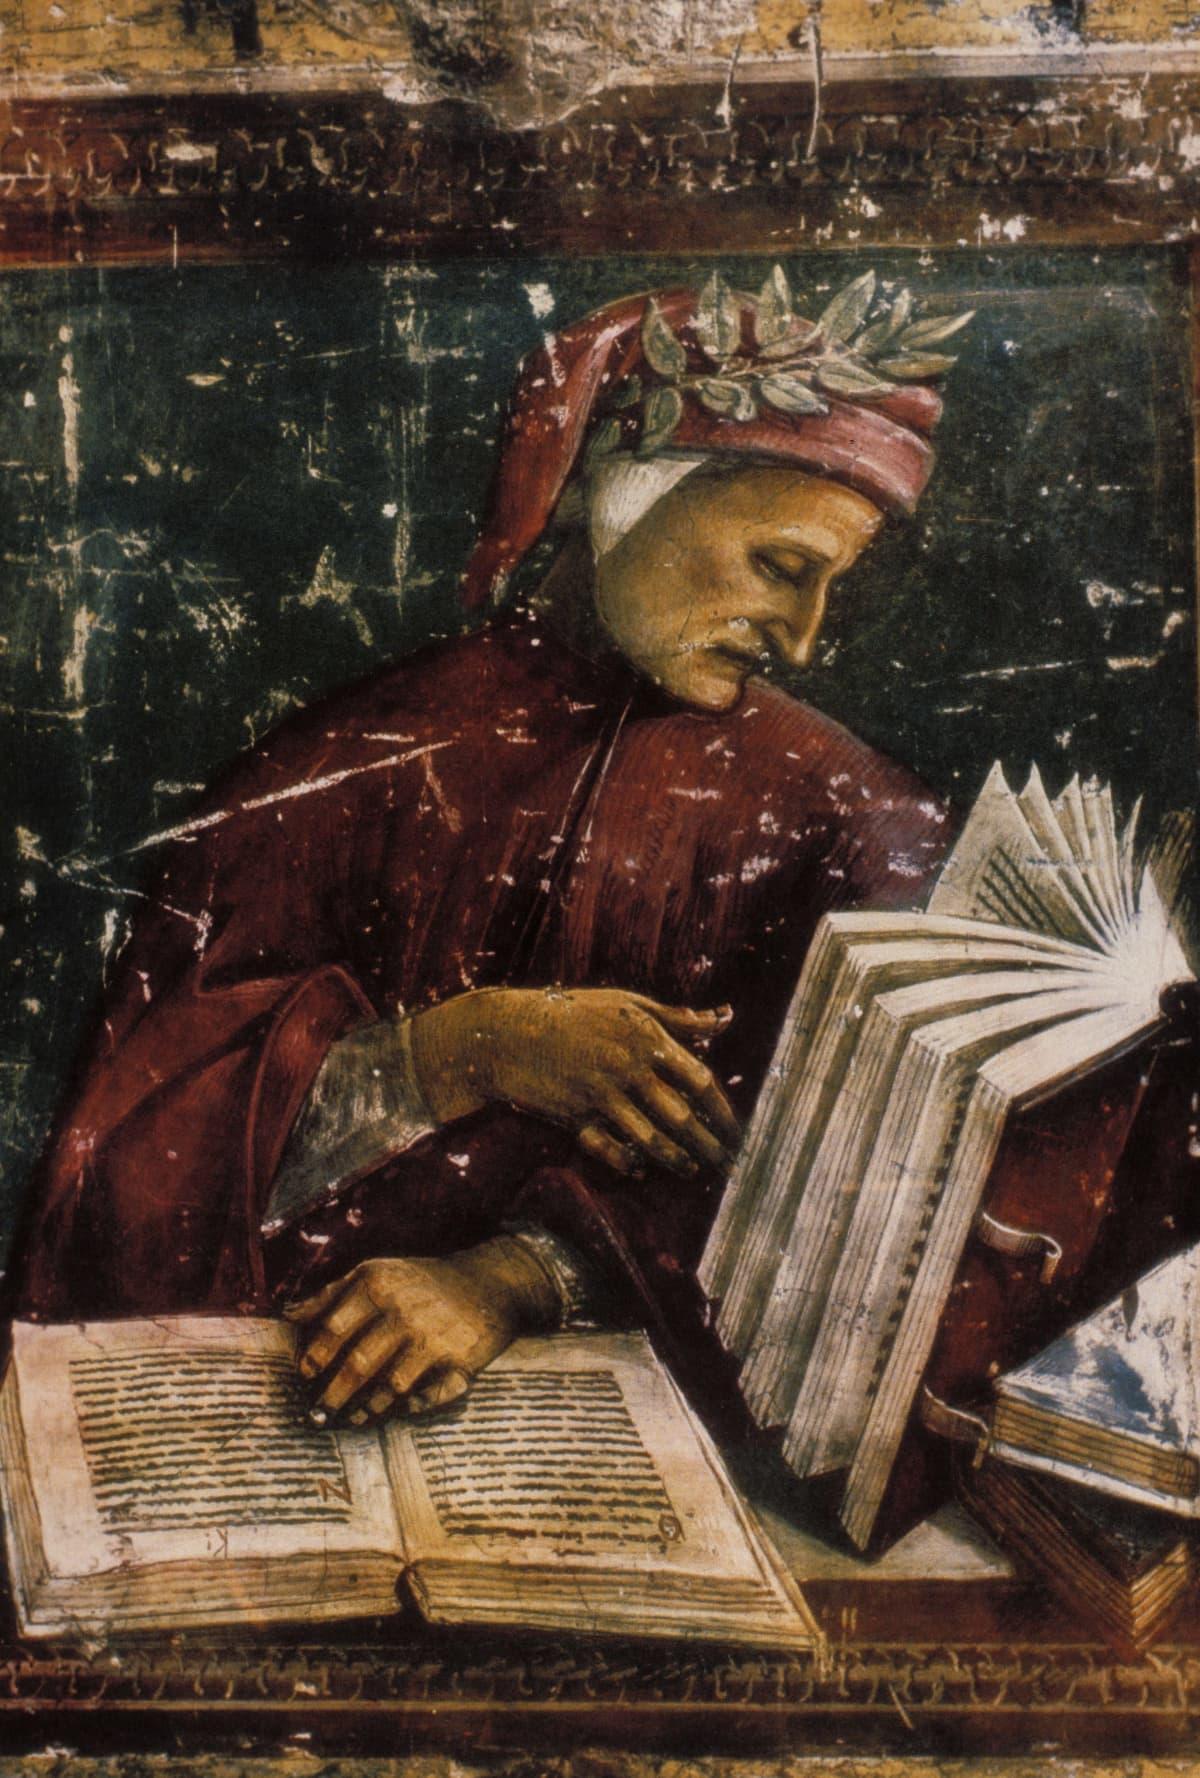 Dante kirjojensa parissa seppele päässä.